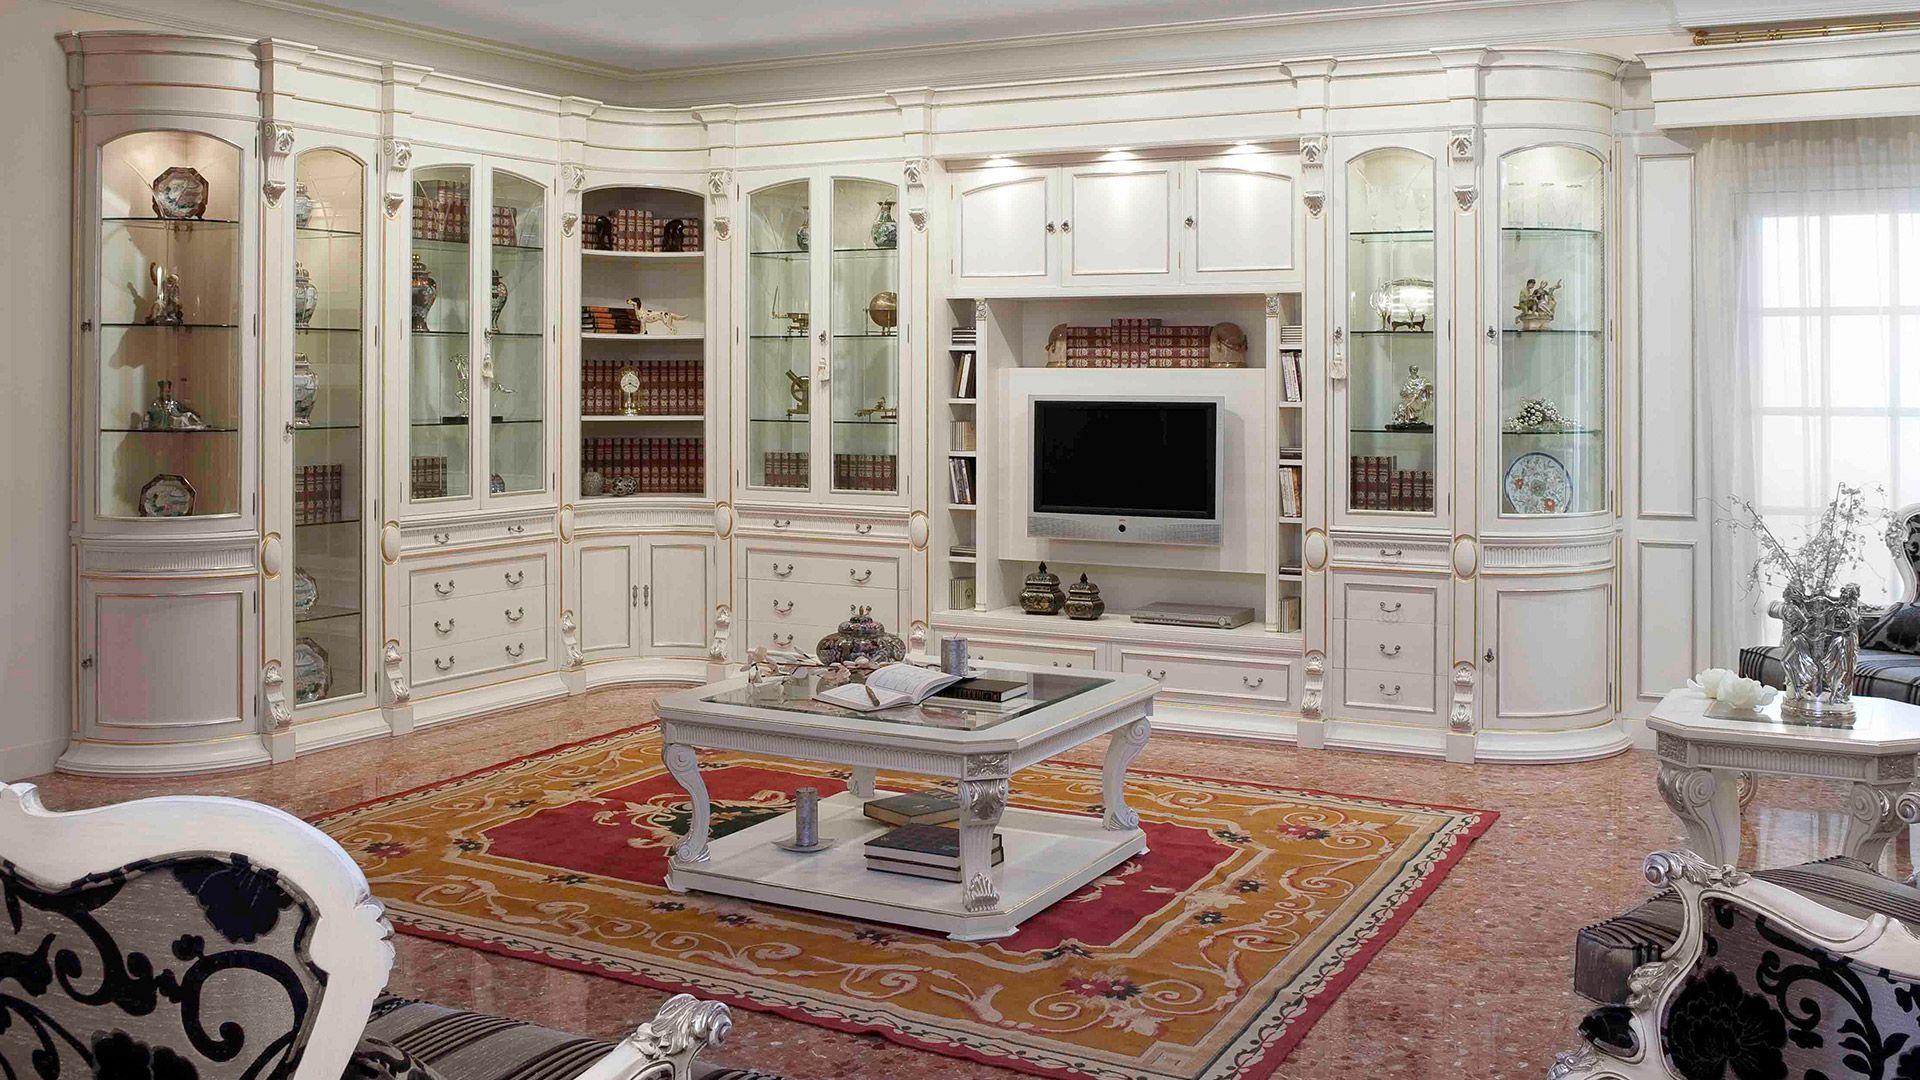 Coleccion Imperio Boisserie Muebles De Lujo Pic  # Muebles Boisserie